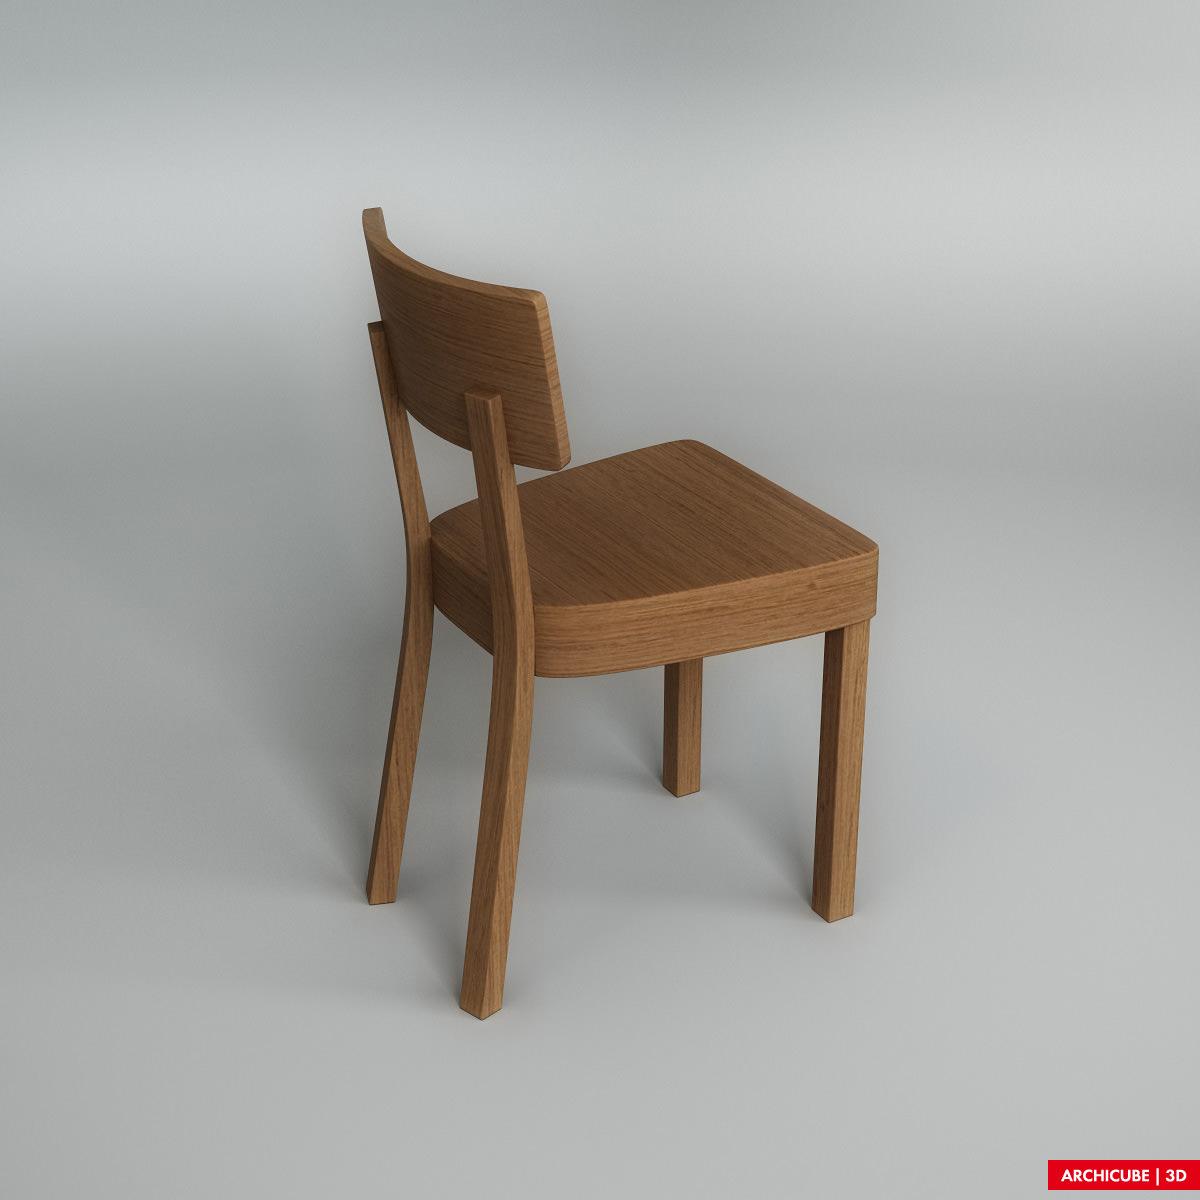 Wooden Chair 3d Model Max Obj Fbx